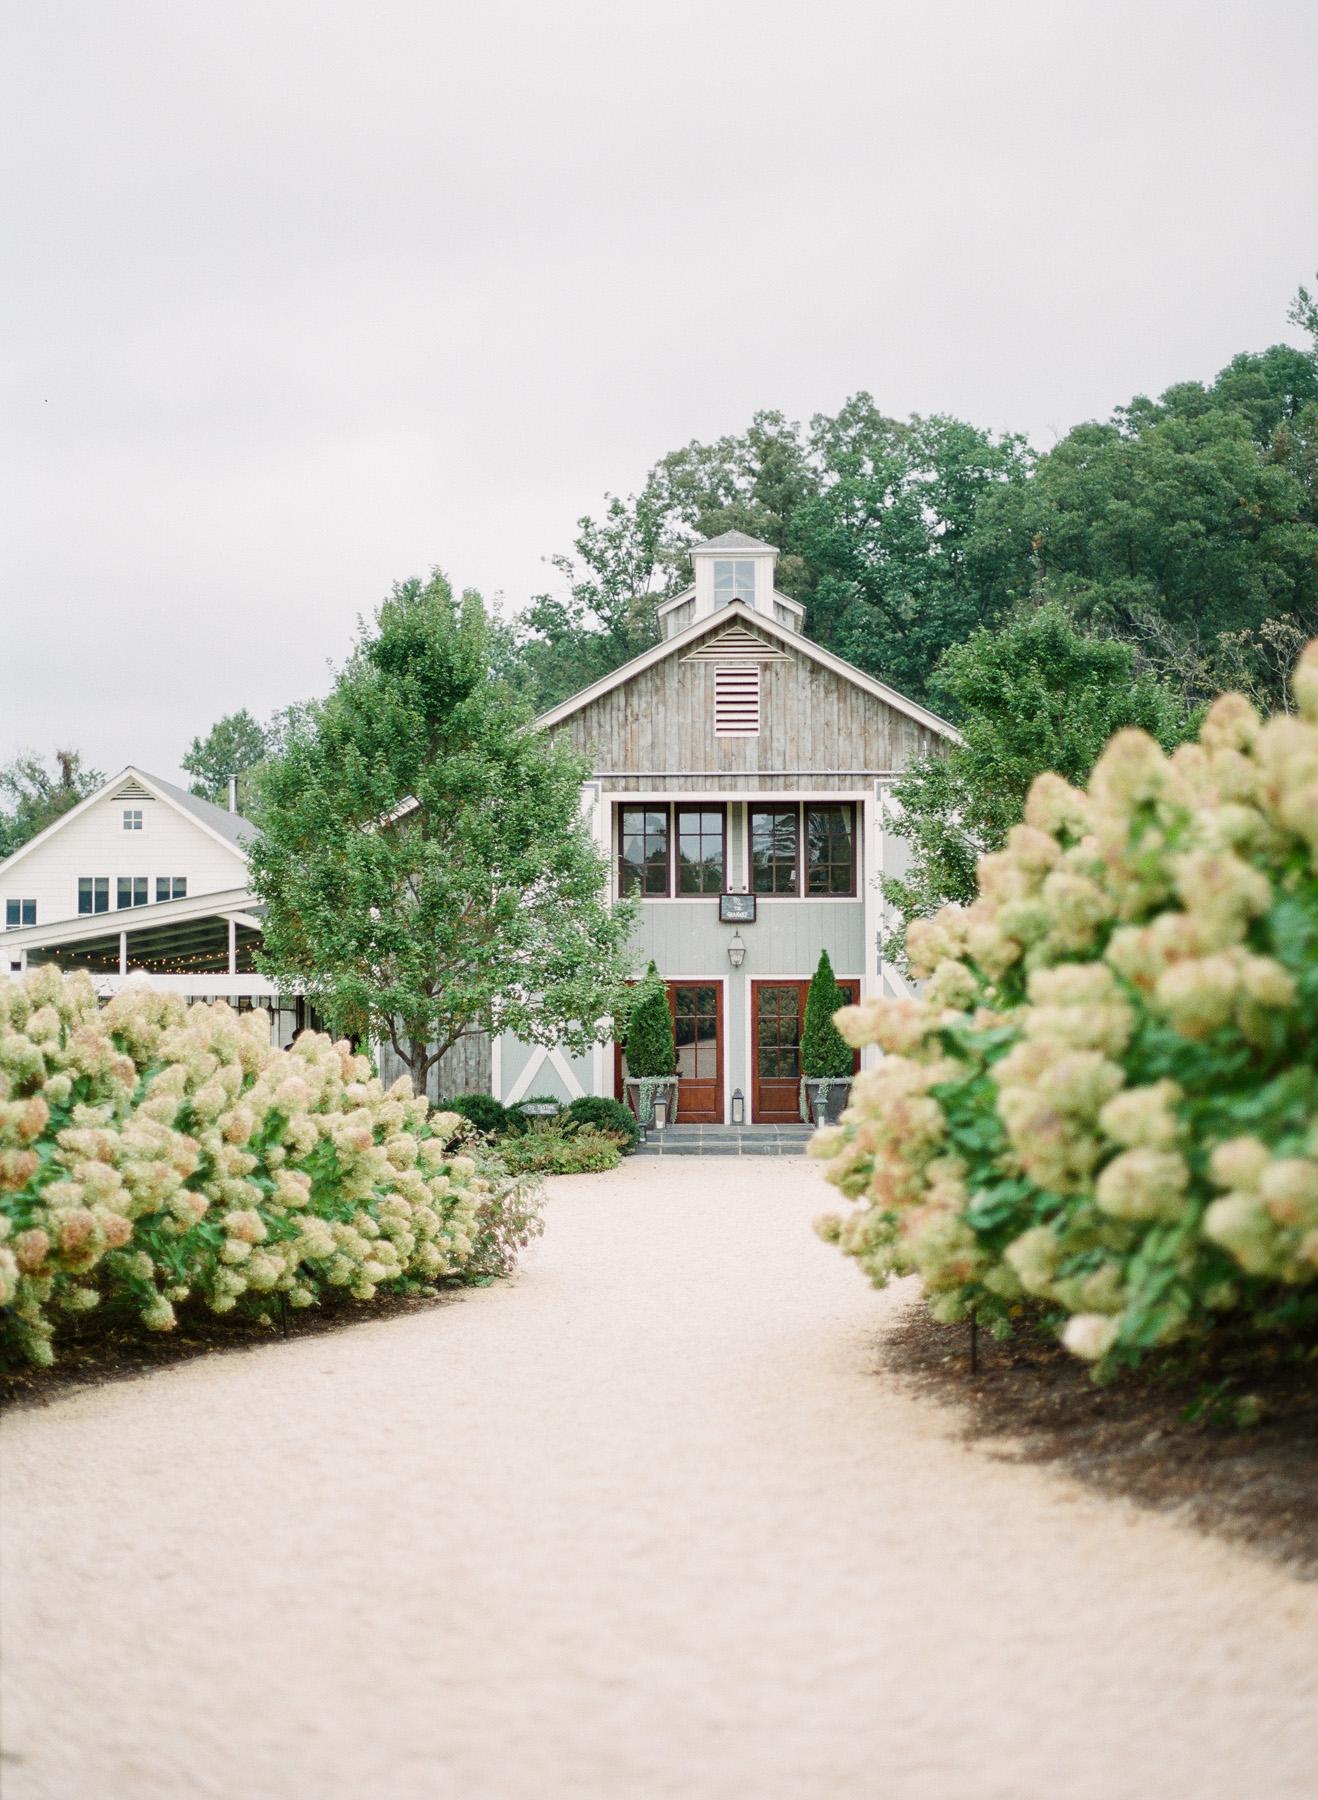 Pippin-Hill-Farm-and-Vinyards-Wedding-Film-Photography-20.jpg